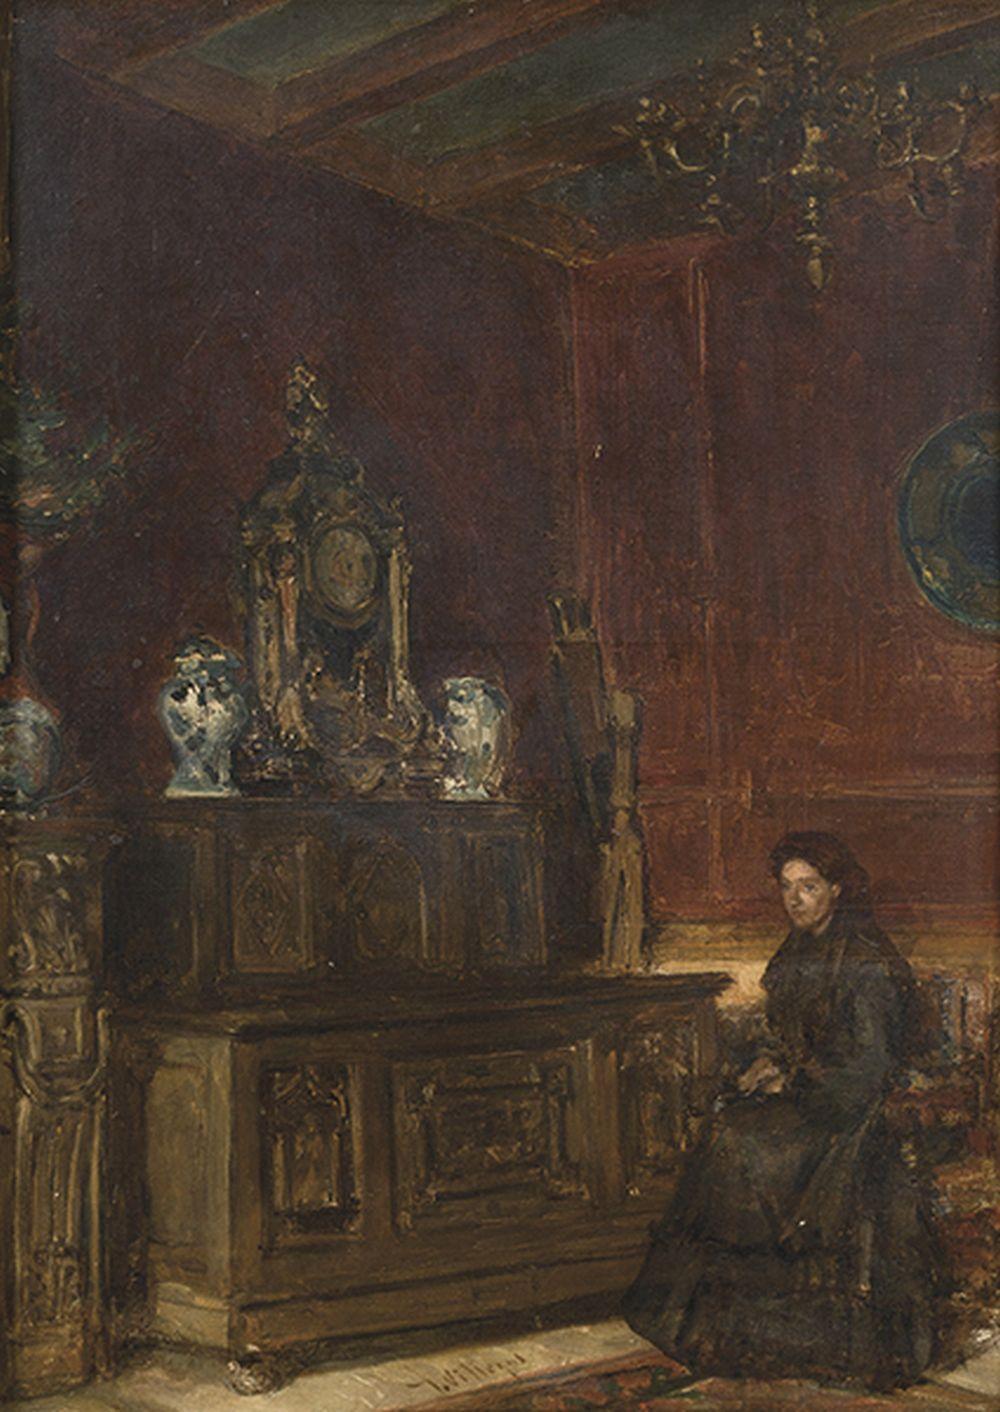 JOSÉ VILLEGAS CORDERO - Lady sitting in an interior